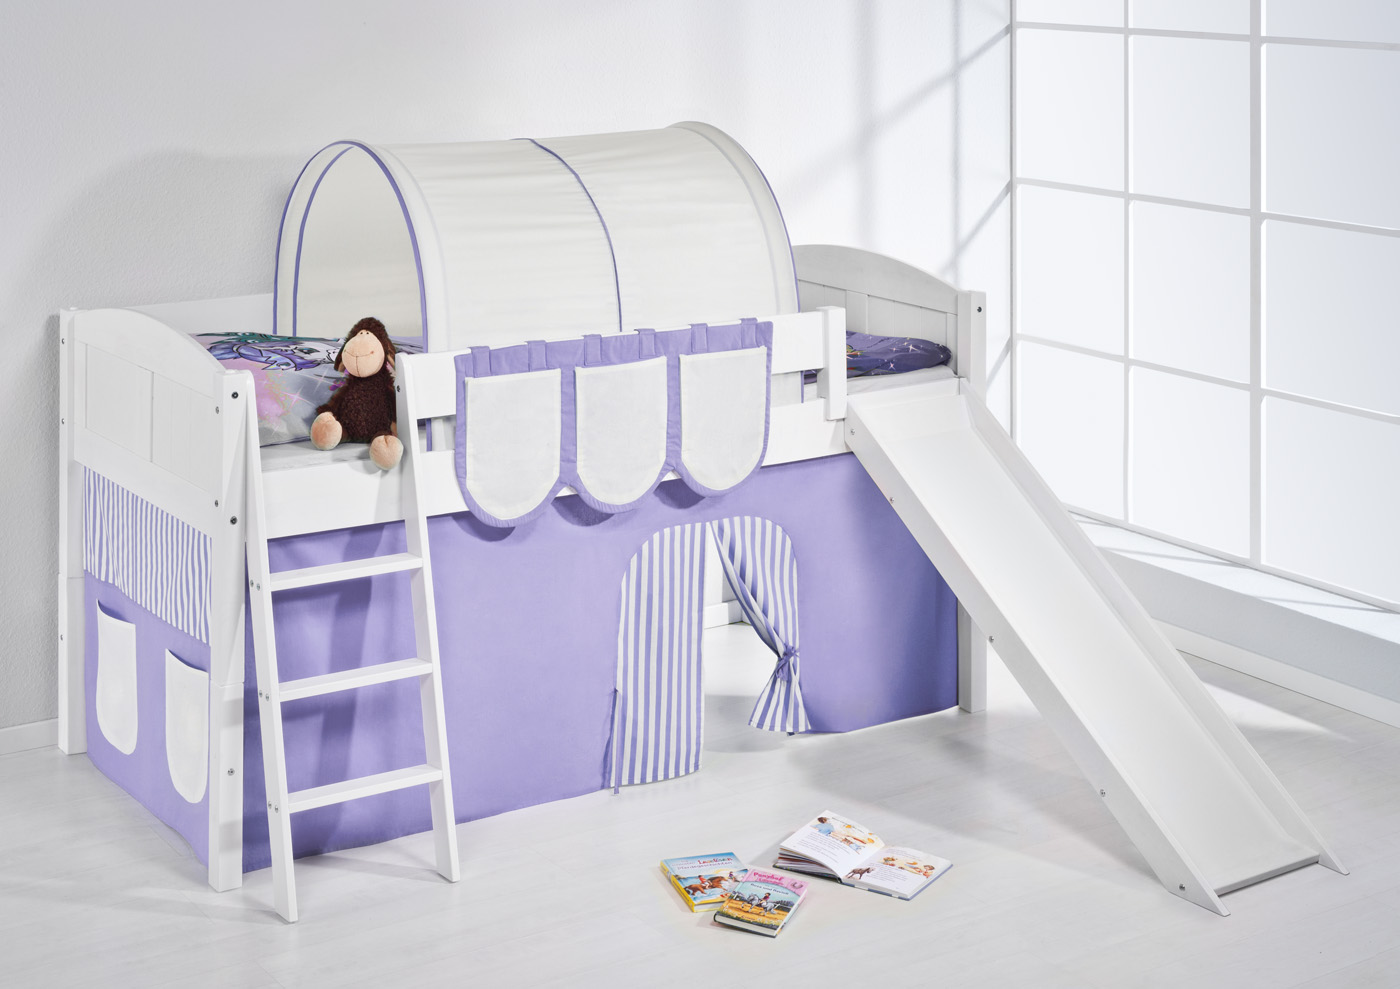 Etagenbett Spielbett : Hochbett spielbett etagenbett massiv mit rutsche neu lilokids